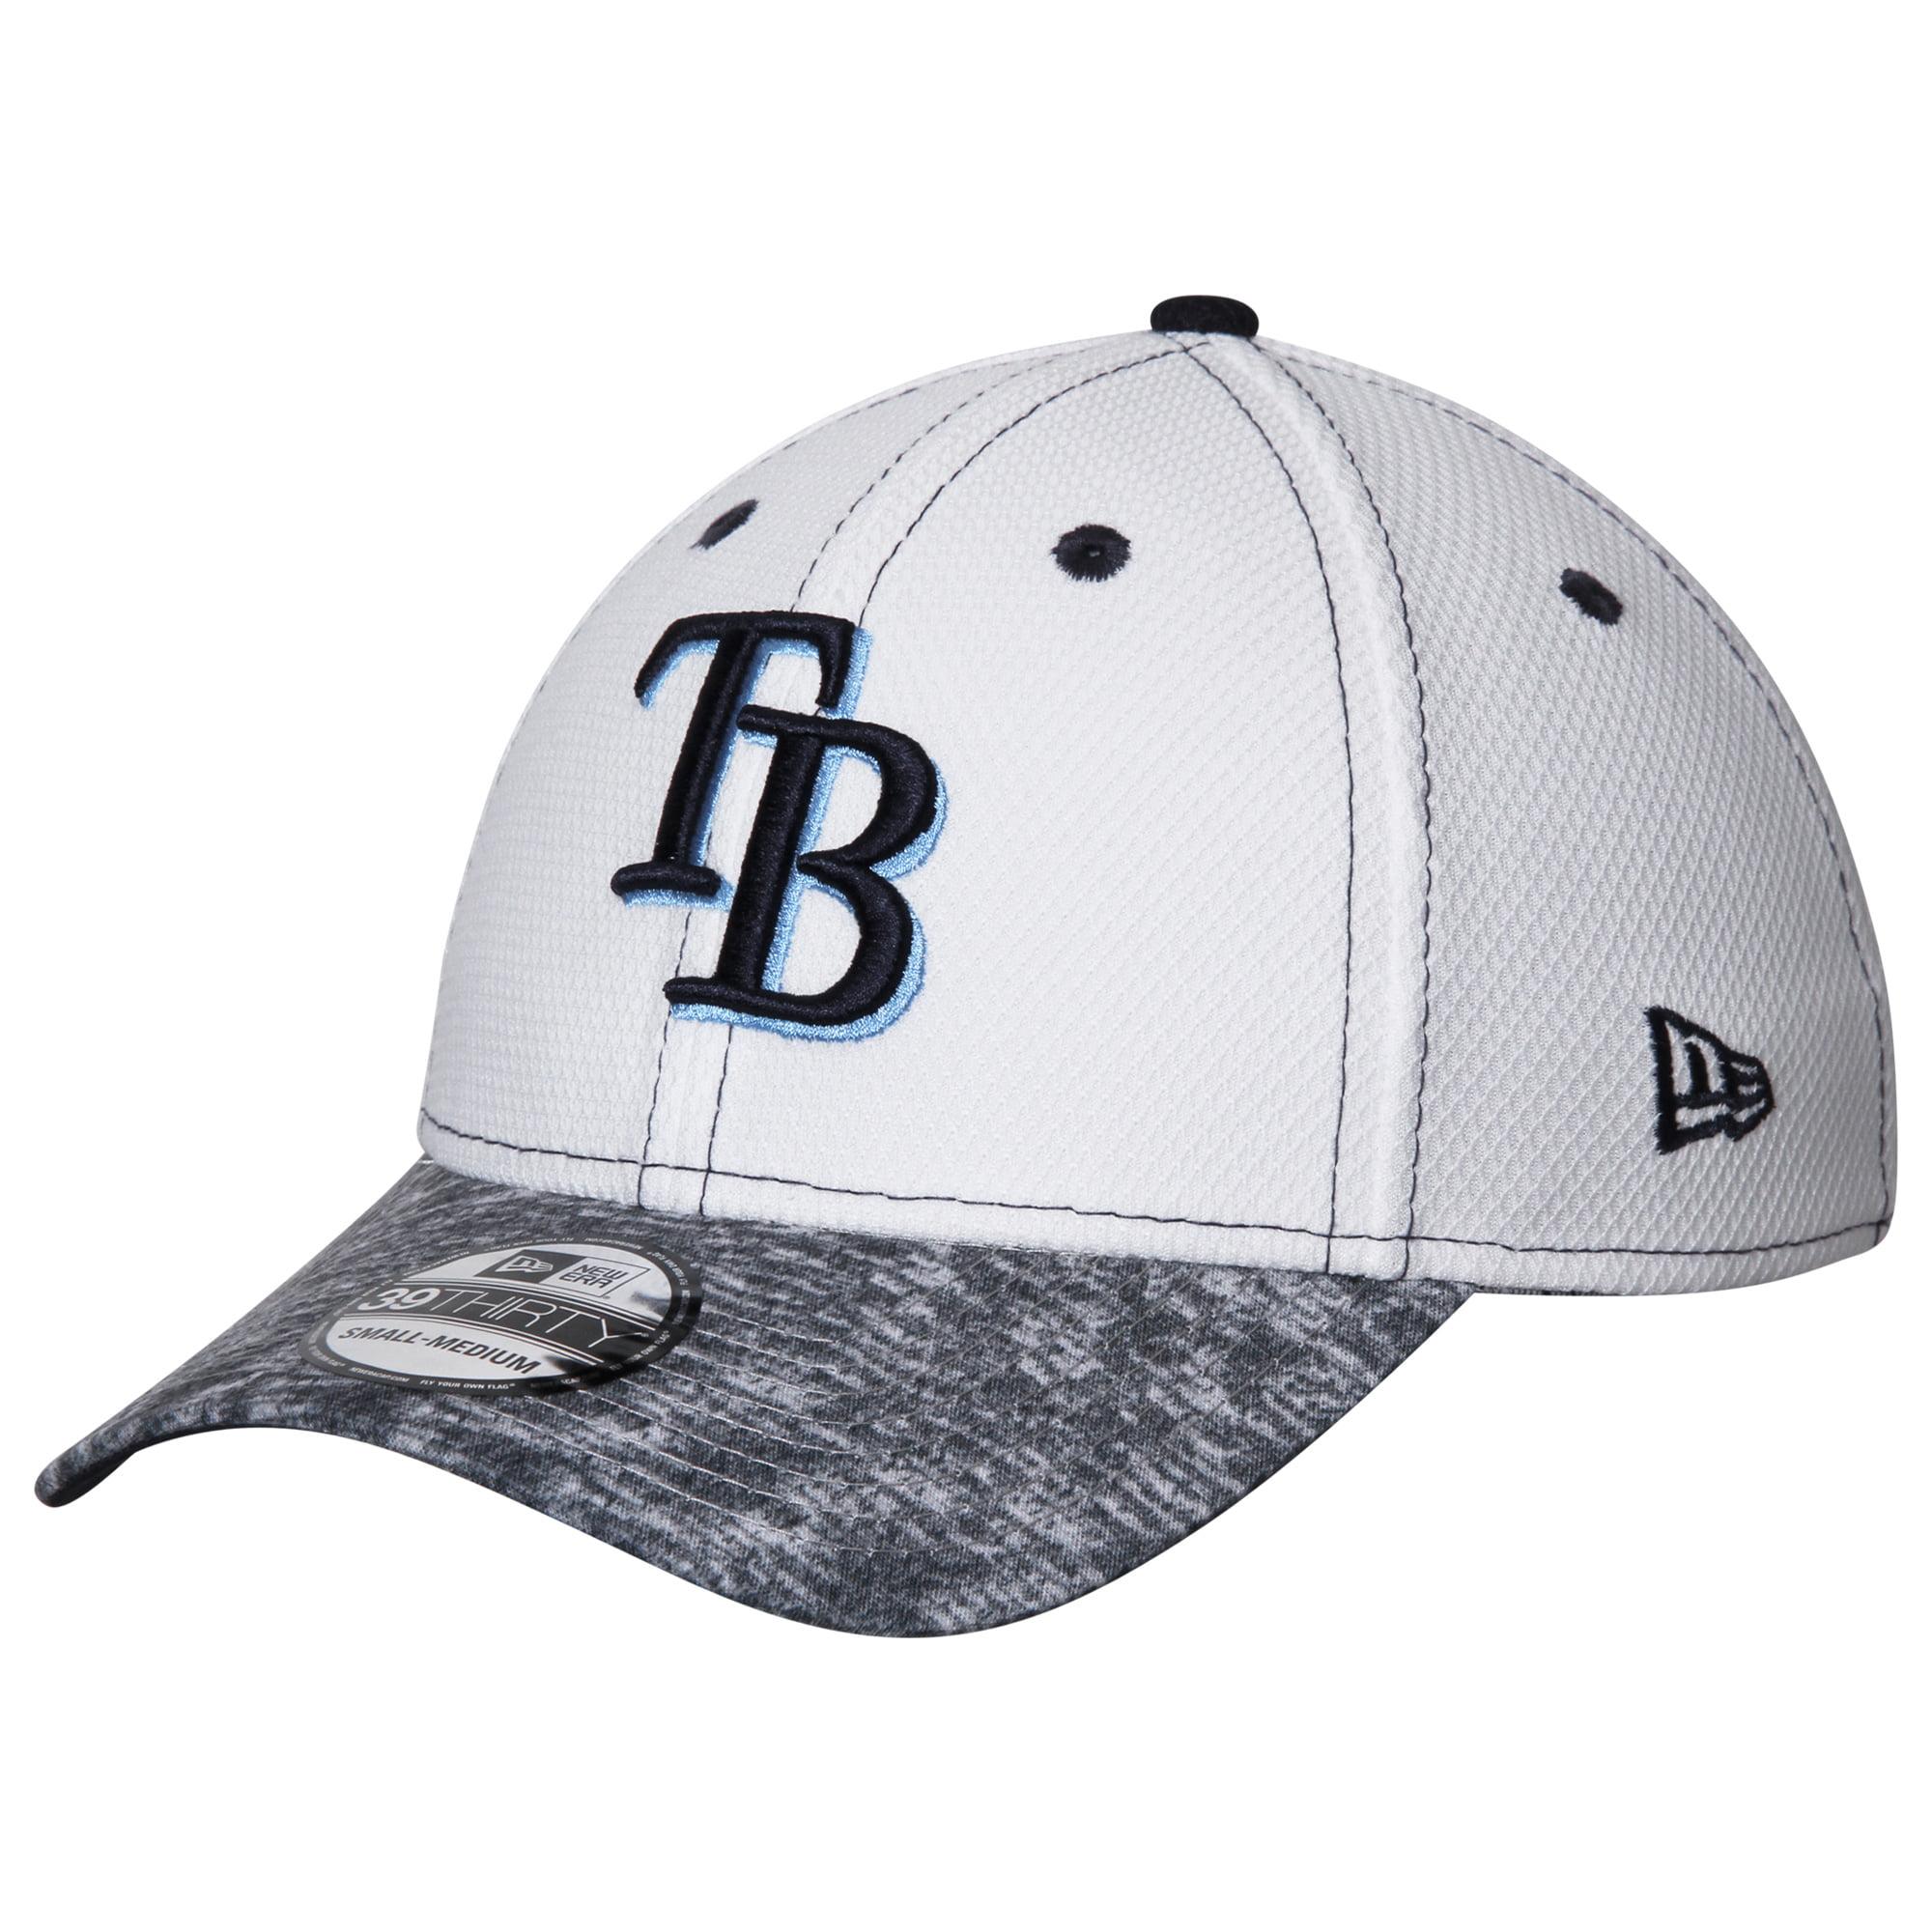 Tampa Bay Rays New Era Tech Stir 39THIRTY Flex Hat - White/Heathered Gray